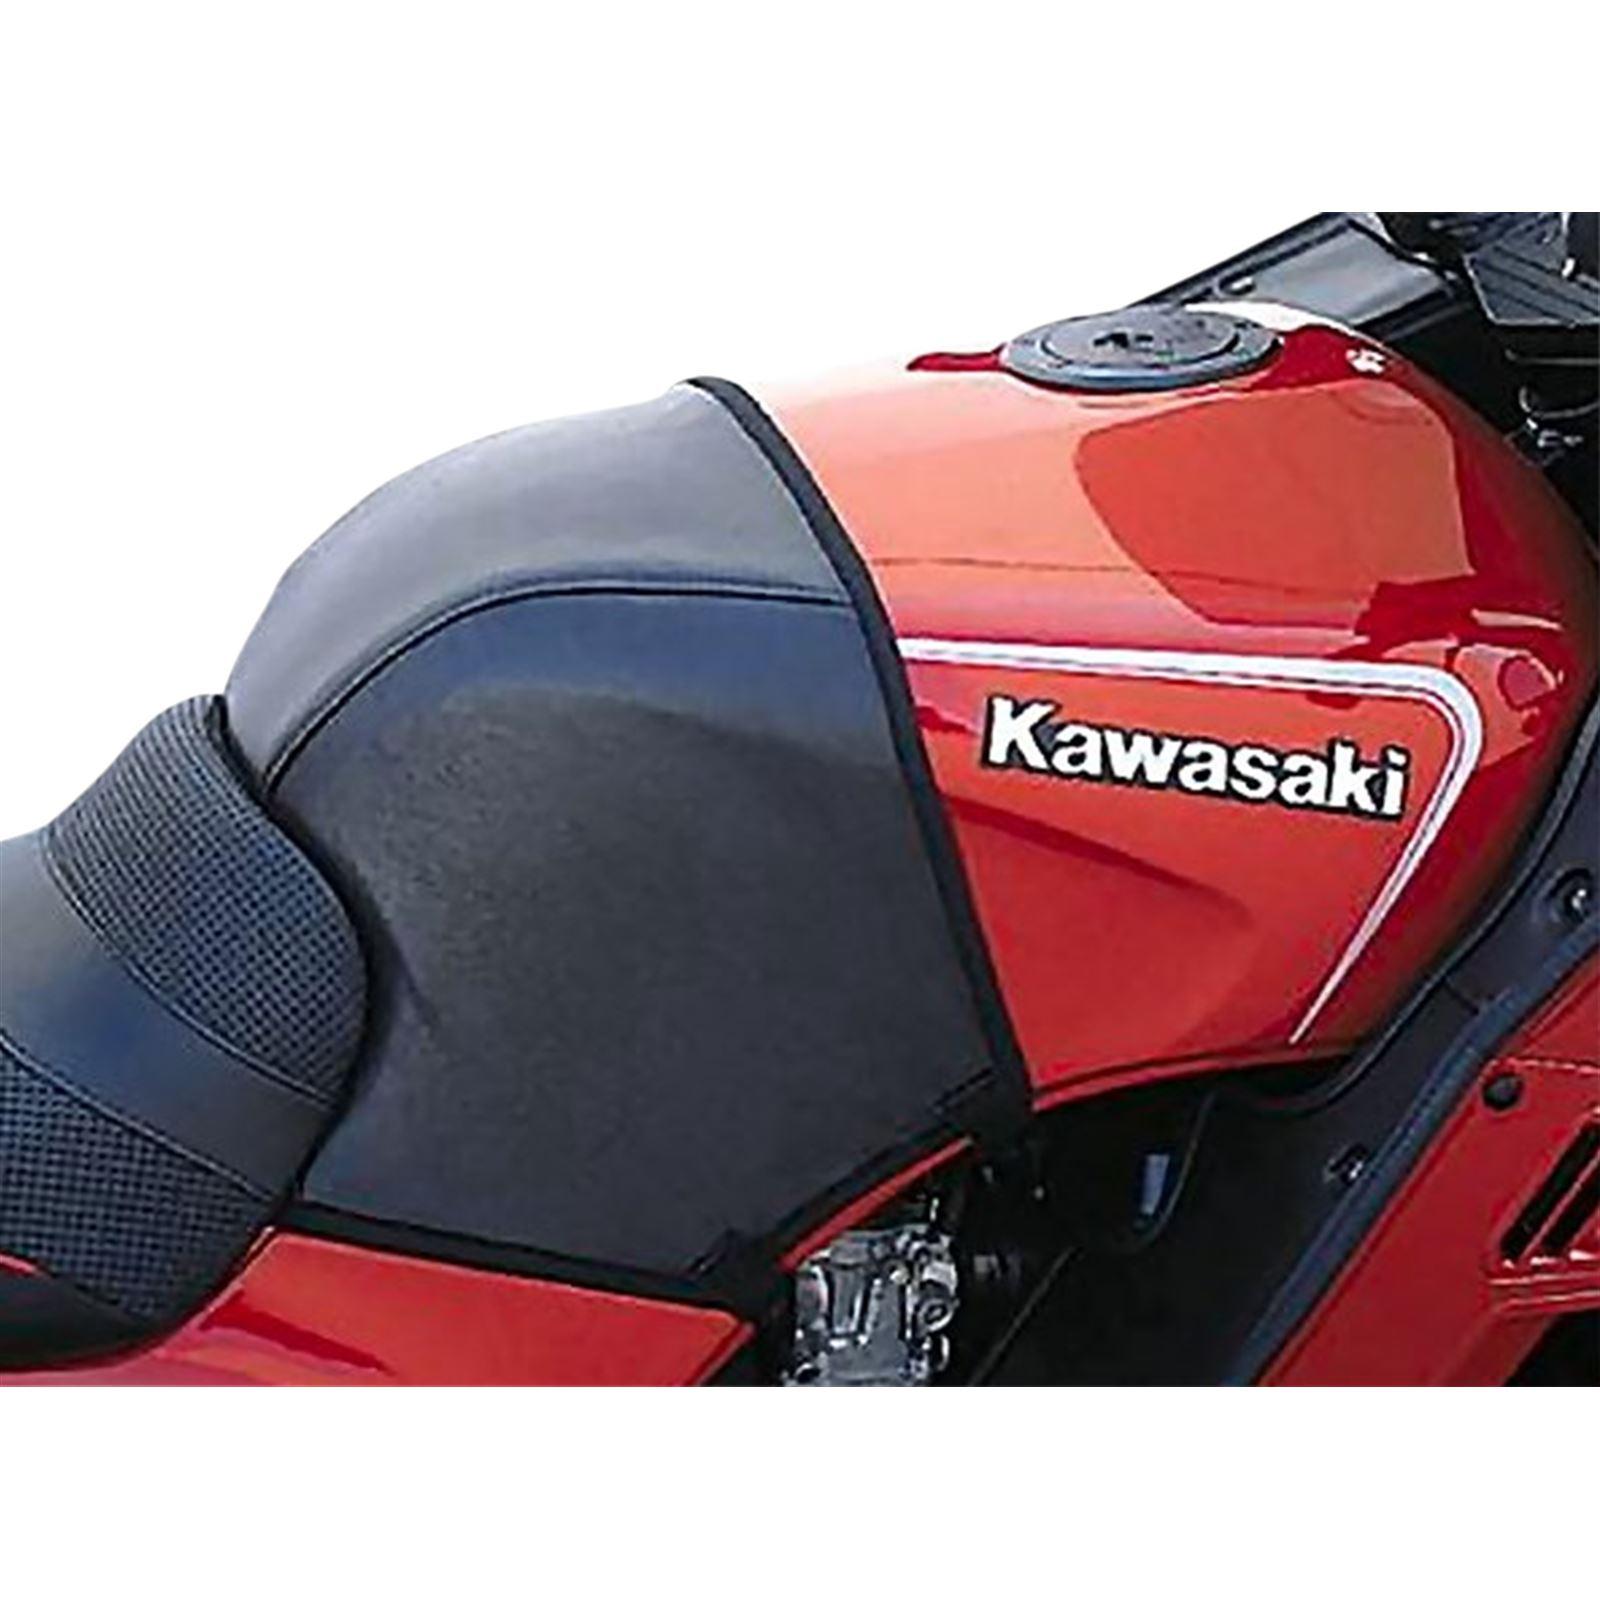 Targa Tank Cover - Black - Half for Kawasaki